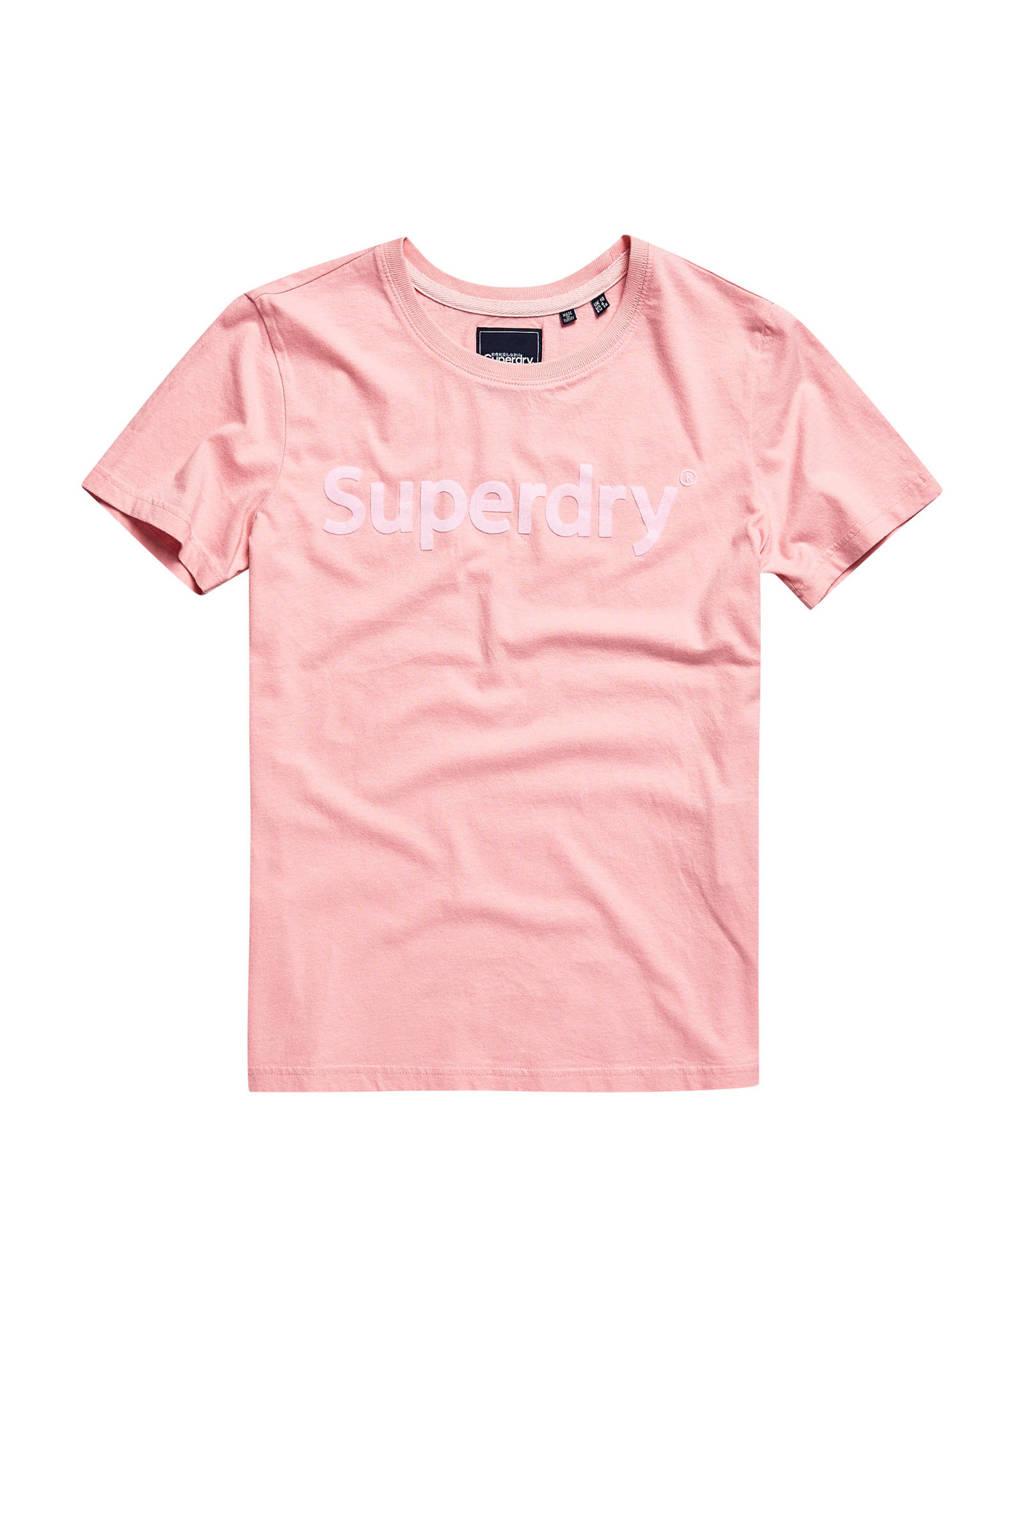 Superdry T-shirt met logo roze, Roze